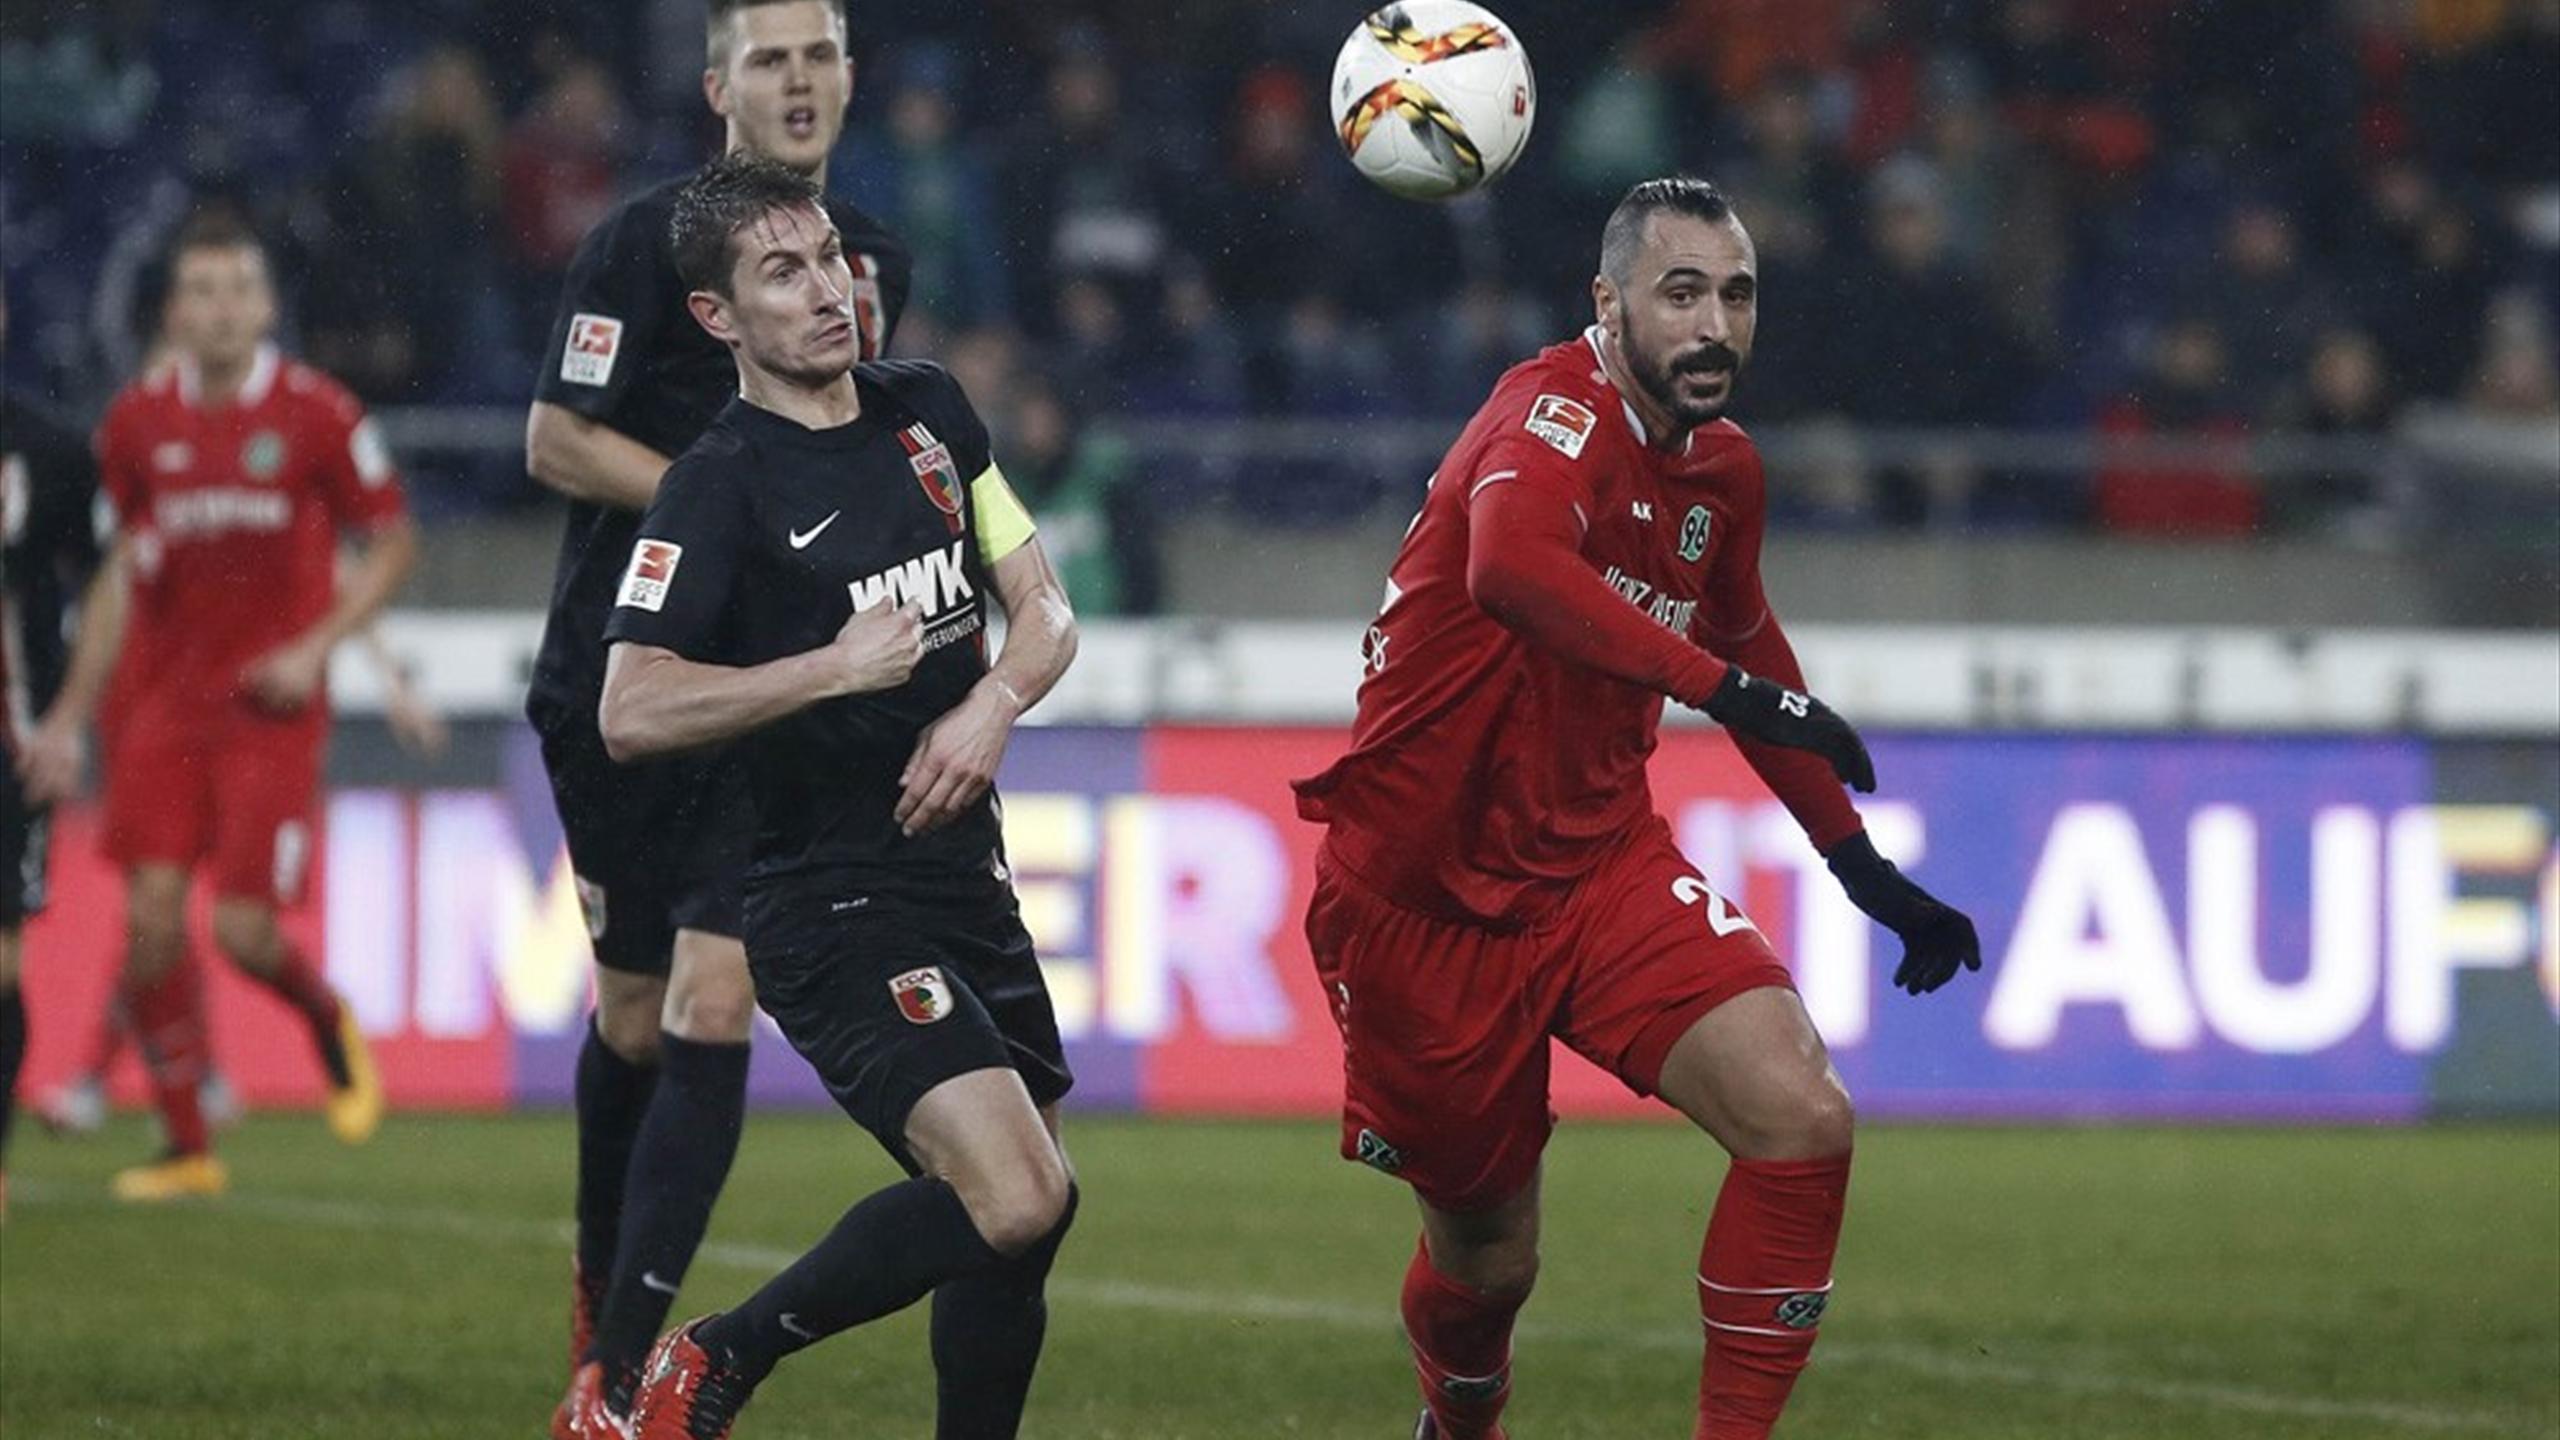 Hugo Almeida, Hannover'ın evinde Augsburg'a 1-0 yenildiği maçta devrede oyuna girdi.